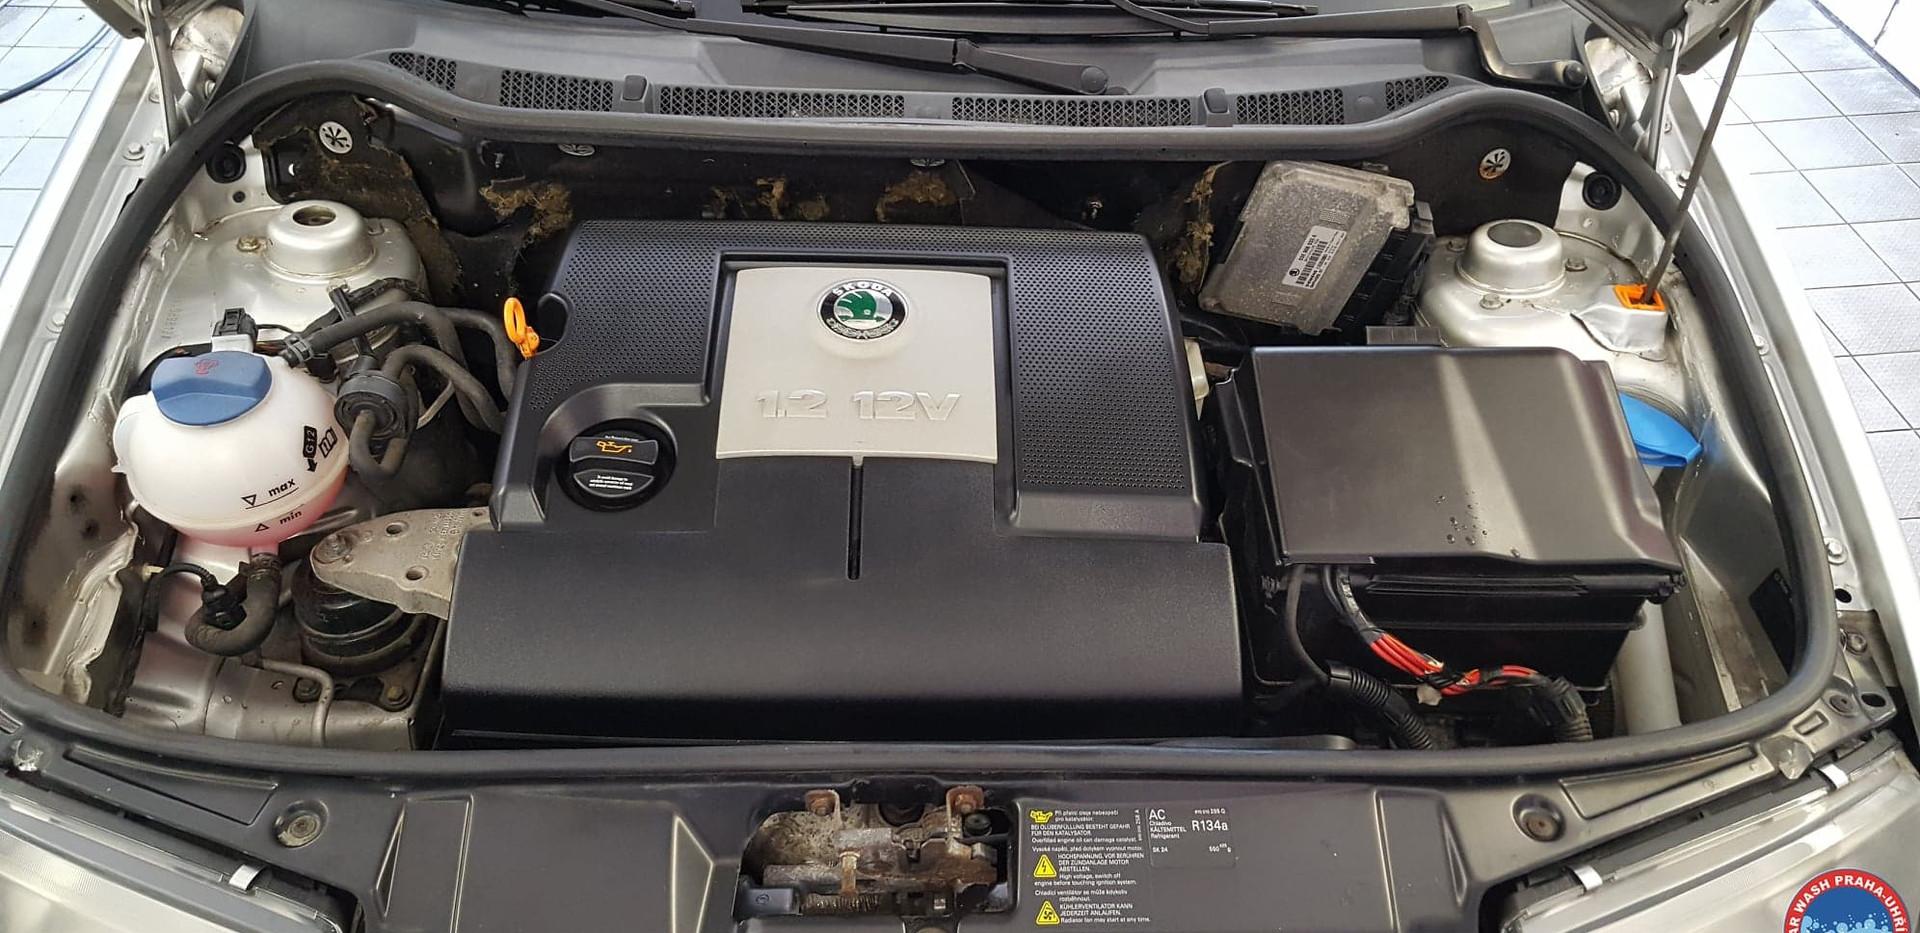 Car Wash - Cisteni motoru (11).jpg